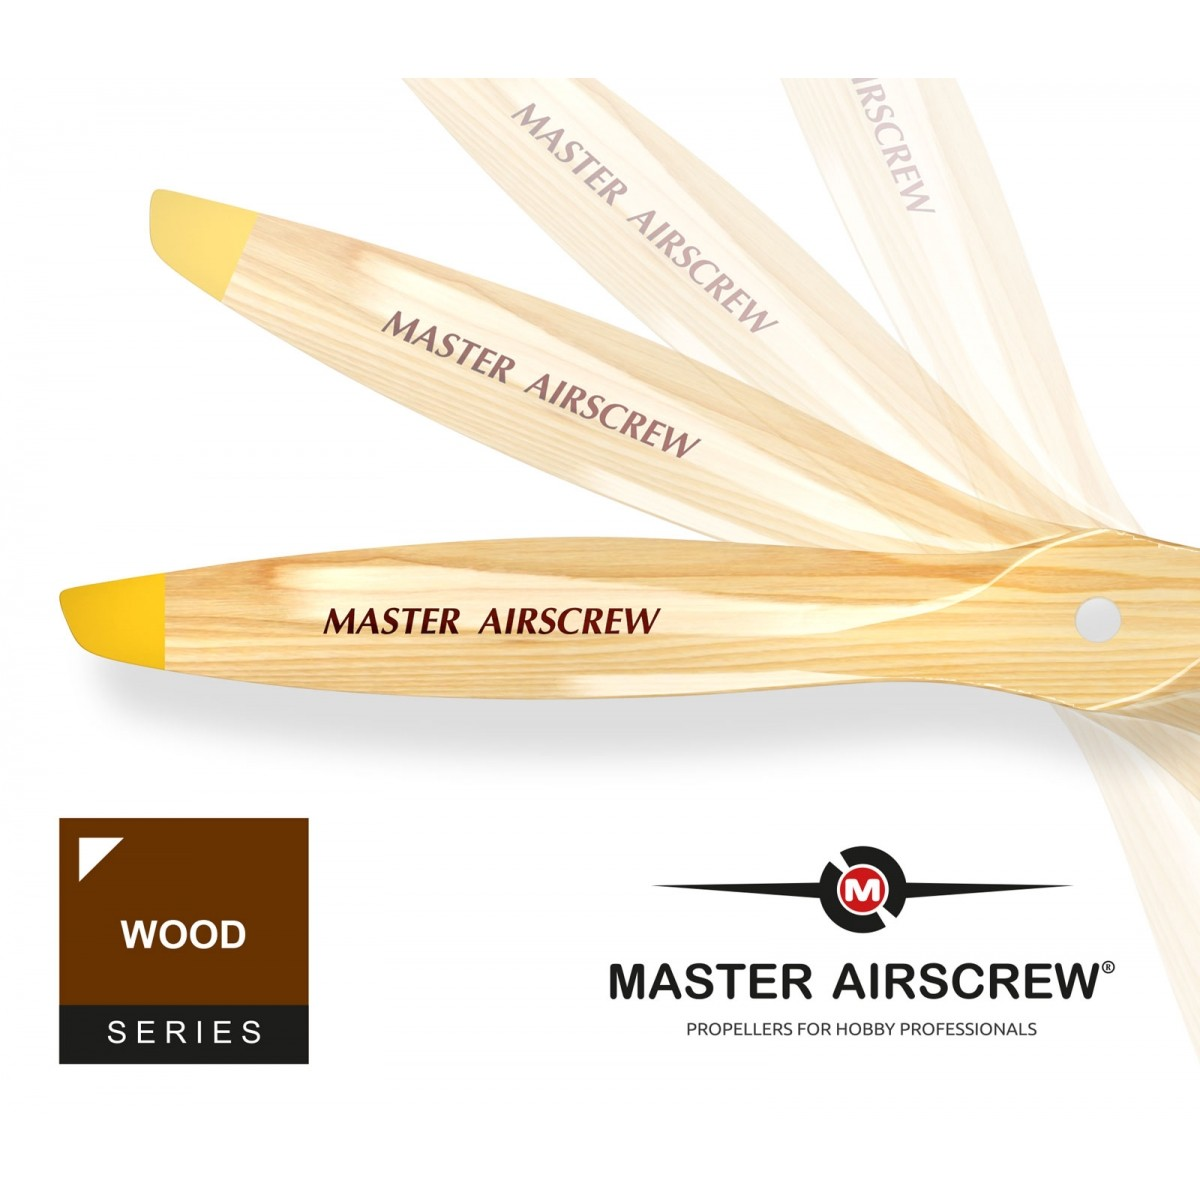 MA0950B - Hélice Master Airscrew Wood Series 9x5